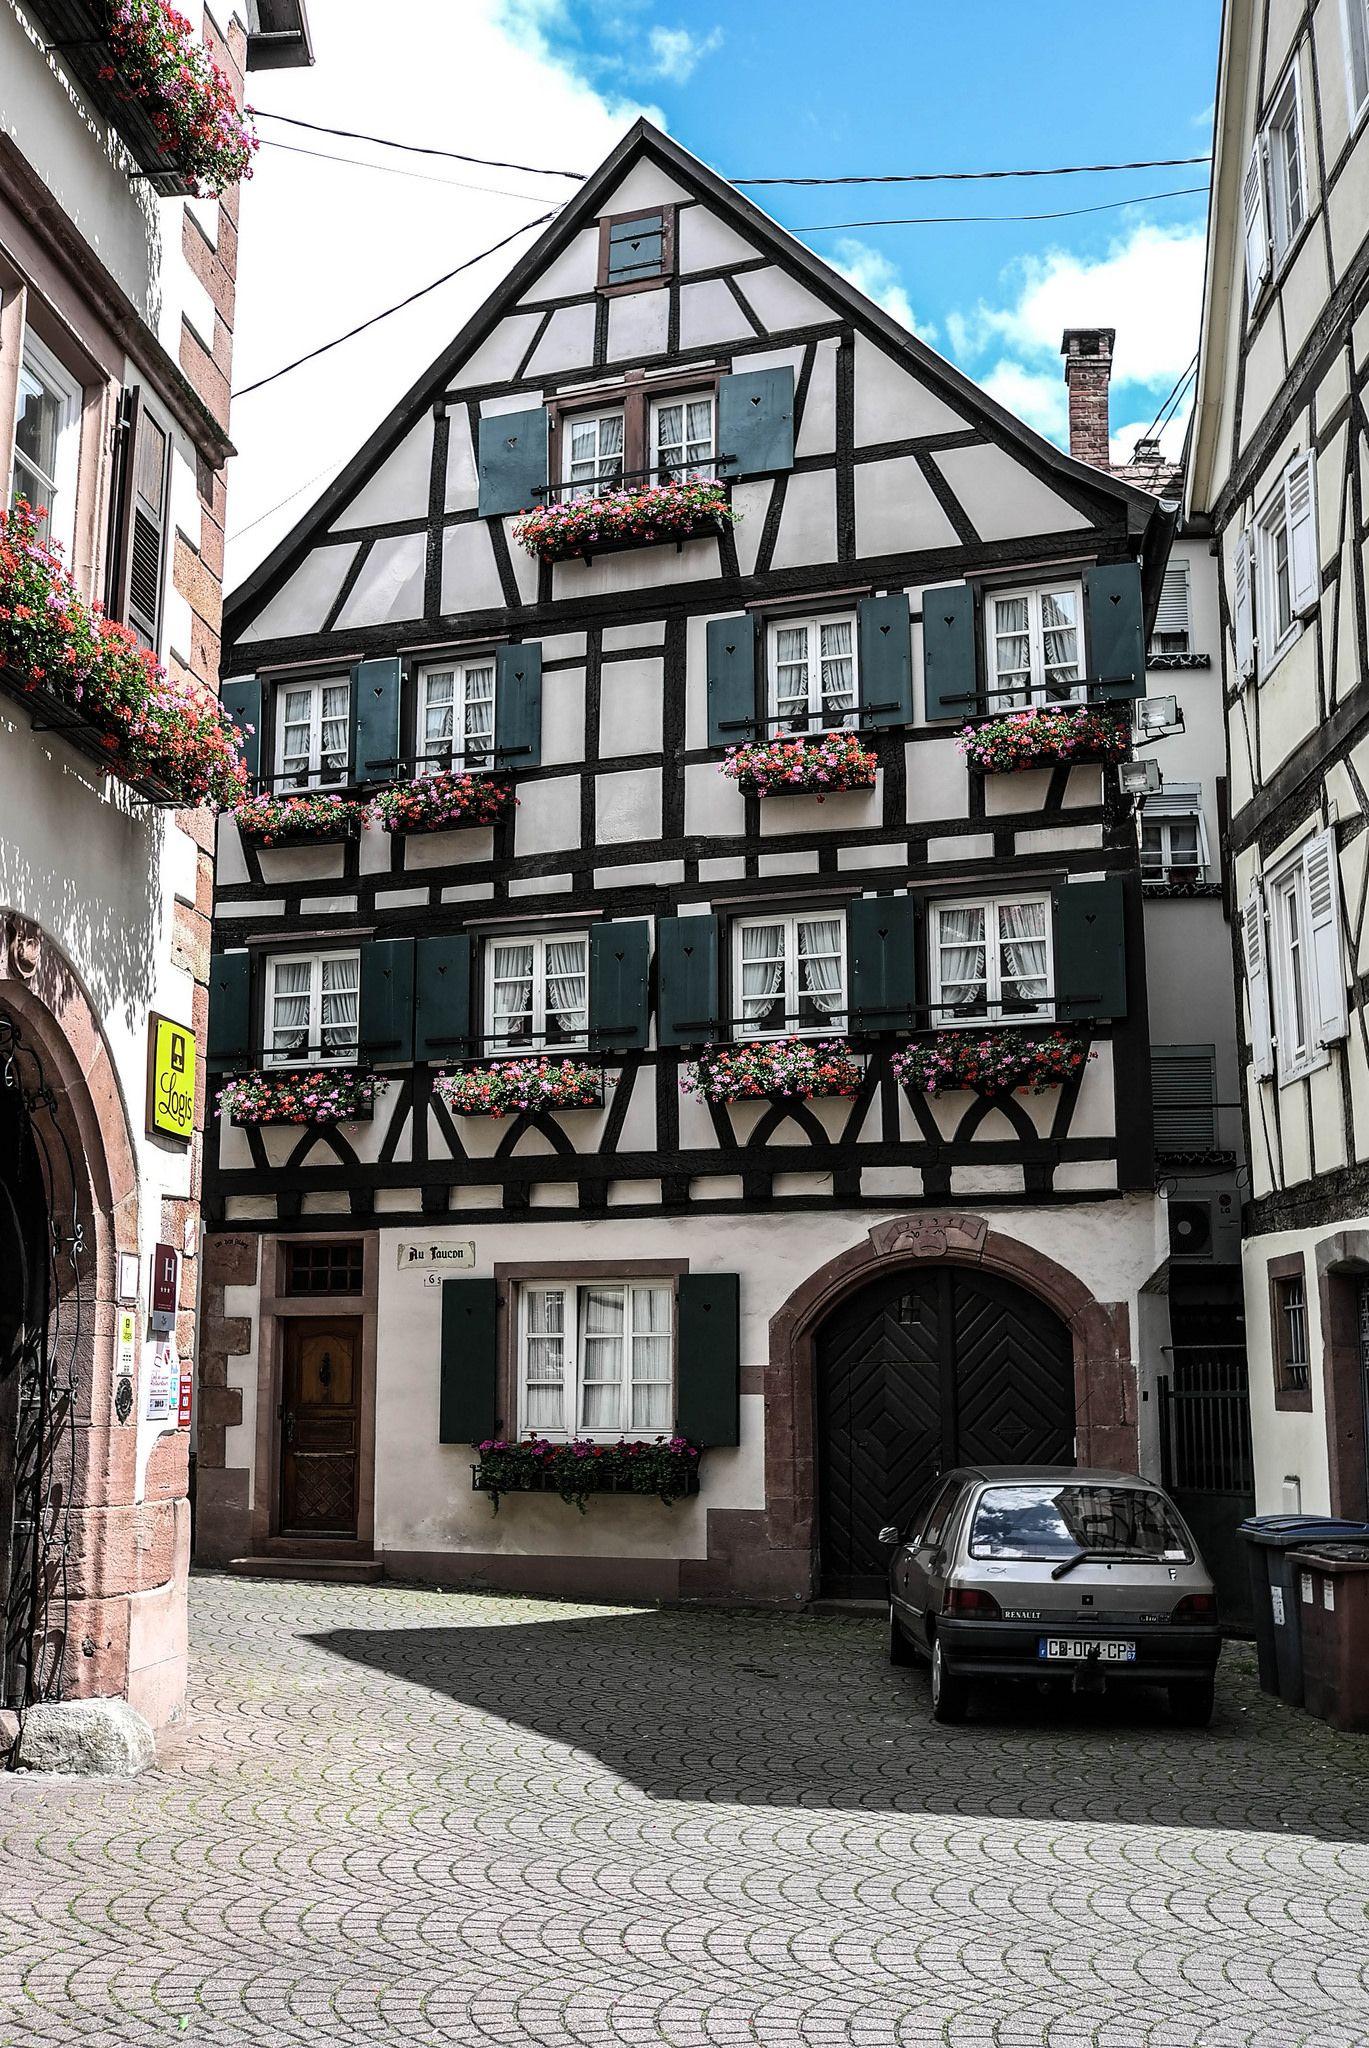 France Wissembourg Alsace Tourisme Champagne Ardenne Alsace